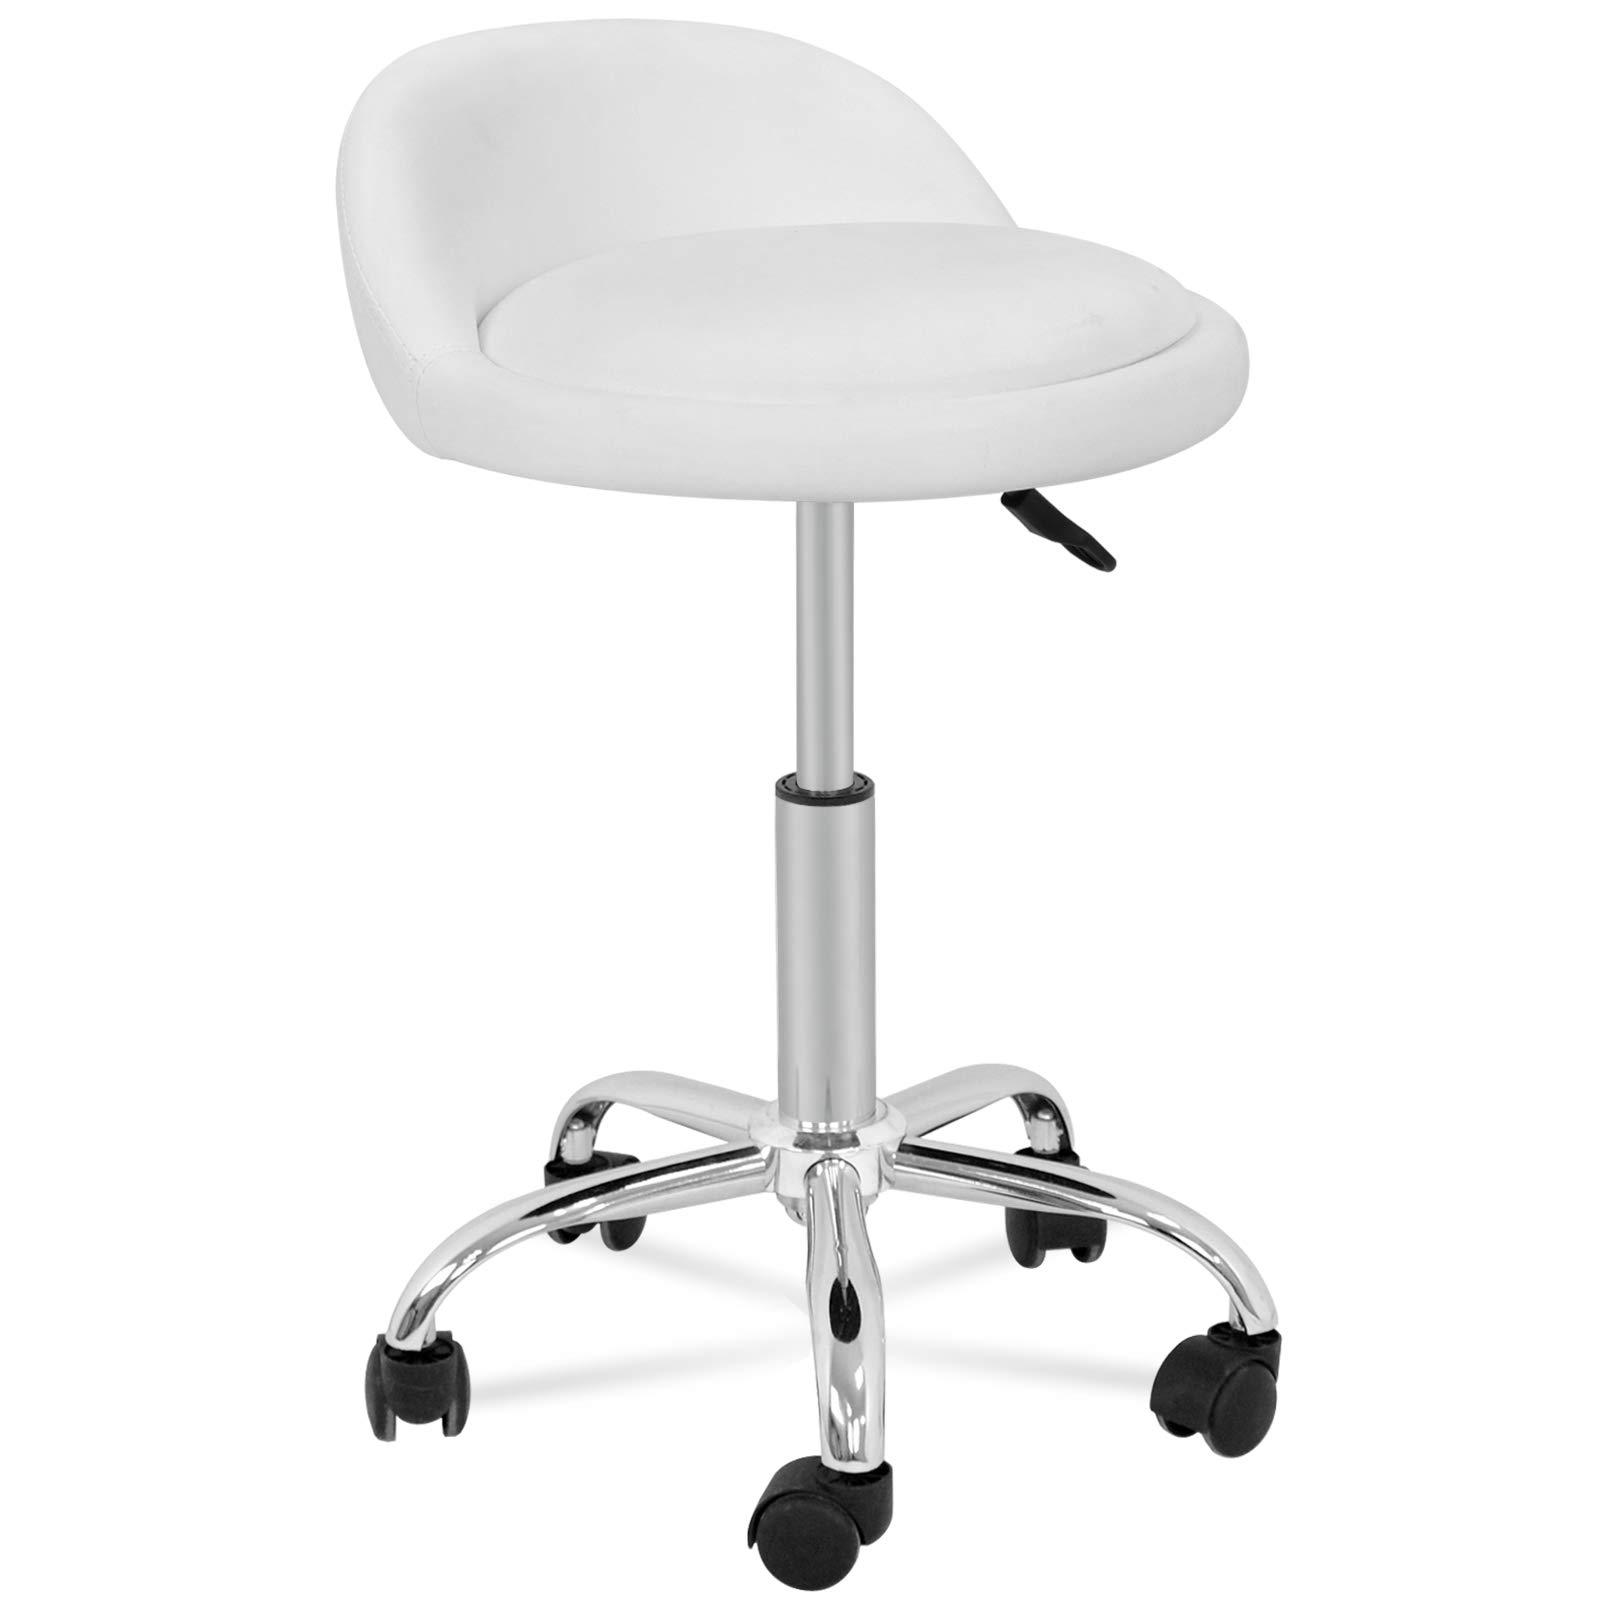 HomGarden Adjustable Hydraulic Rolling Swivel Stool for Massage Salon Office Facial Spa Medical Tattoo Chair Stool w/Backrest Cushion & Wheels (White 1pcs)